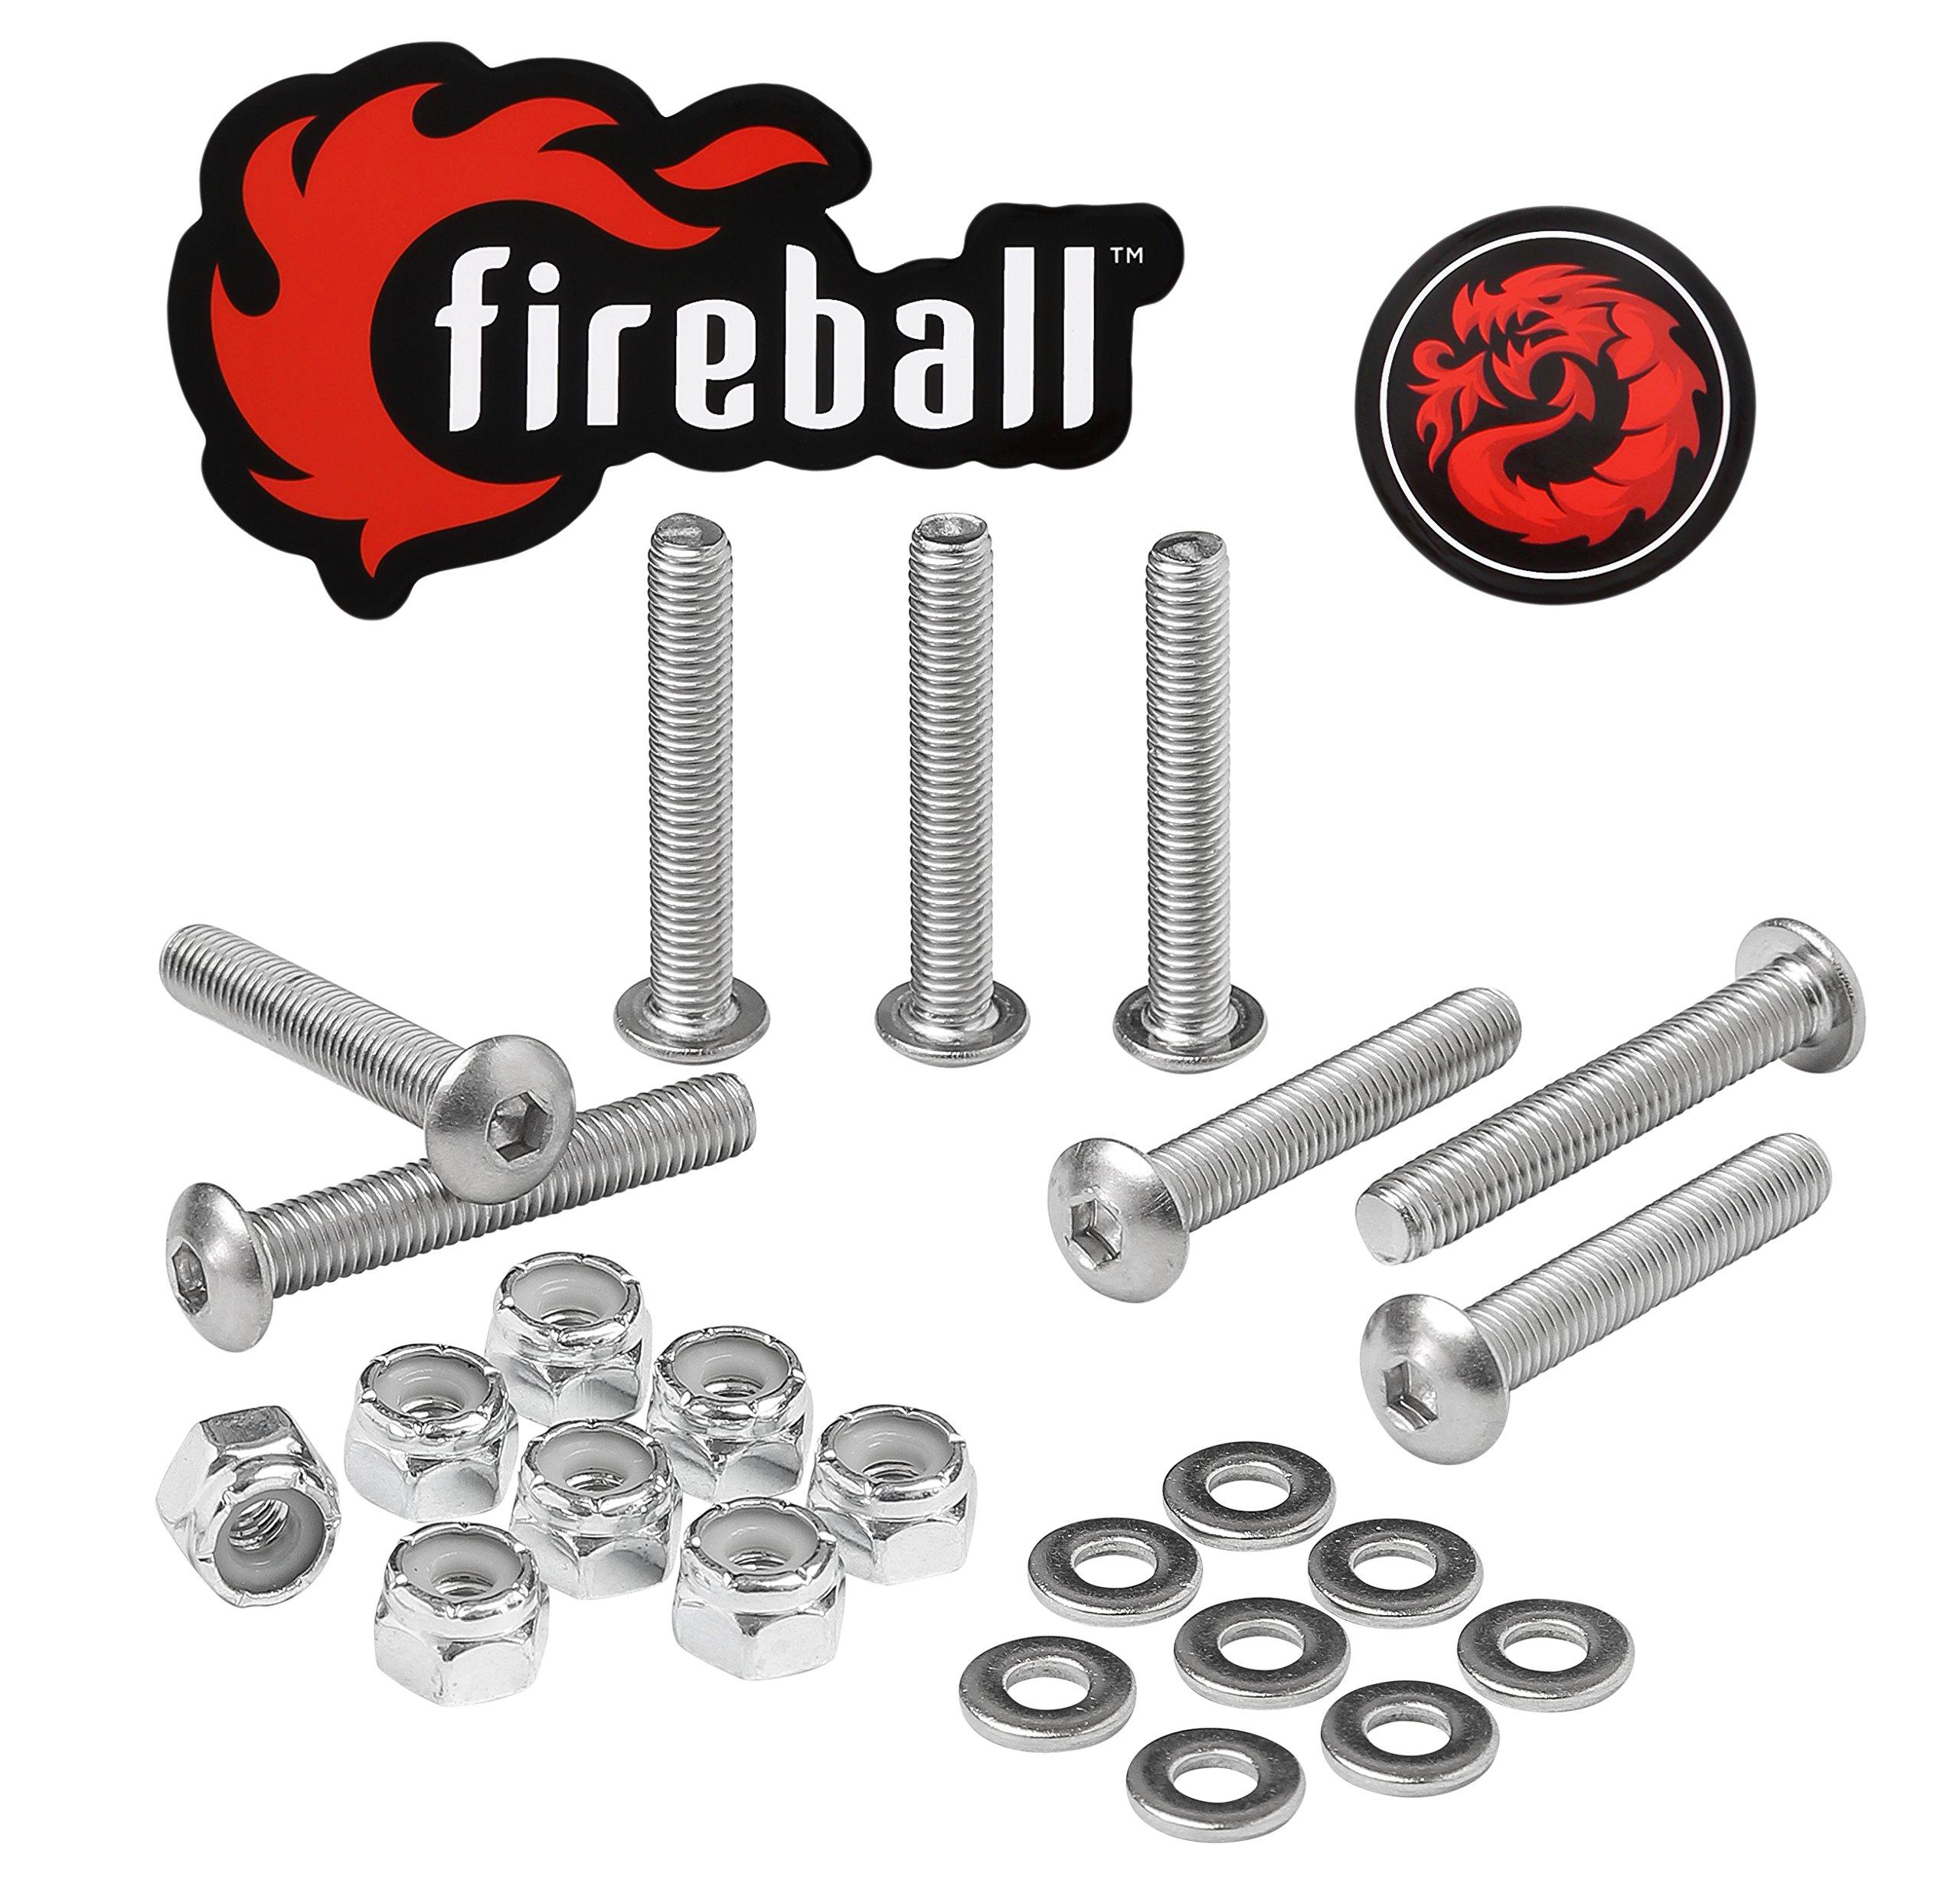 Fireball Dragon Stainless Steel Skateboard Hardware Set (Button Allen, 1.25'') by Fireball (Image #1)